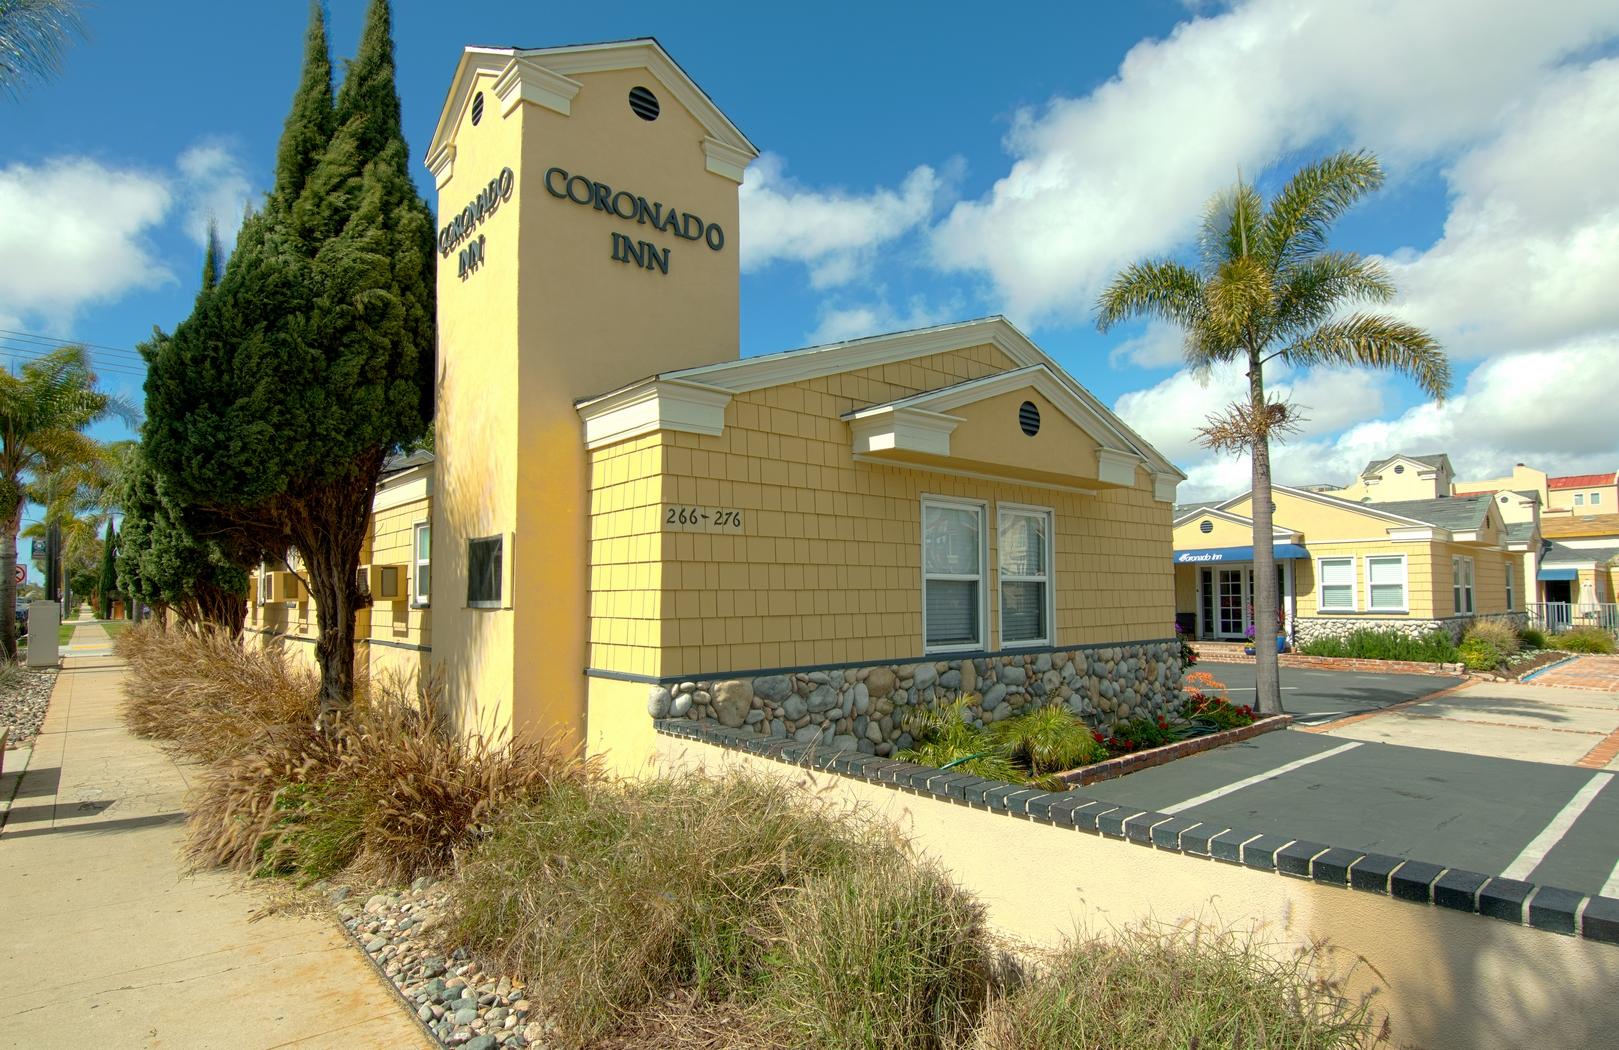 Coronado Inn + Coronado Island Inn (Coronado)